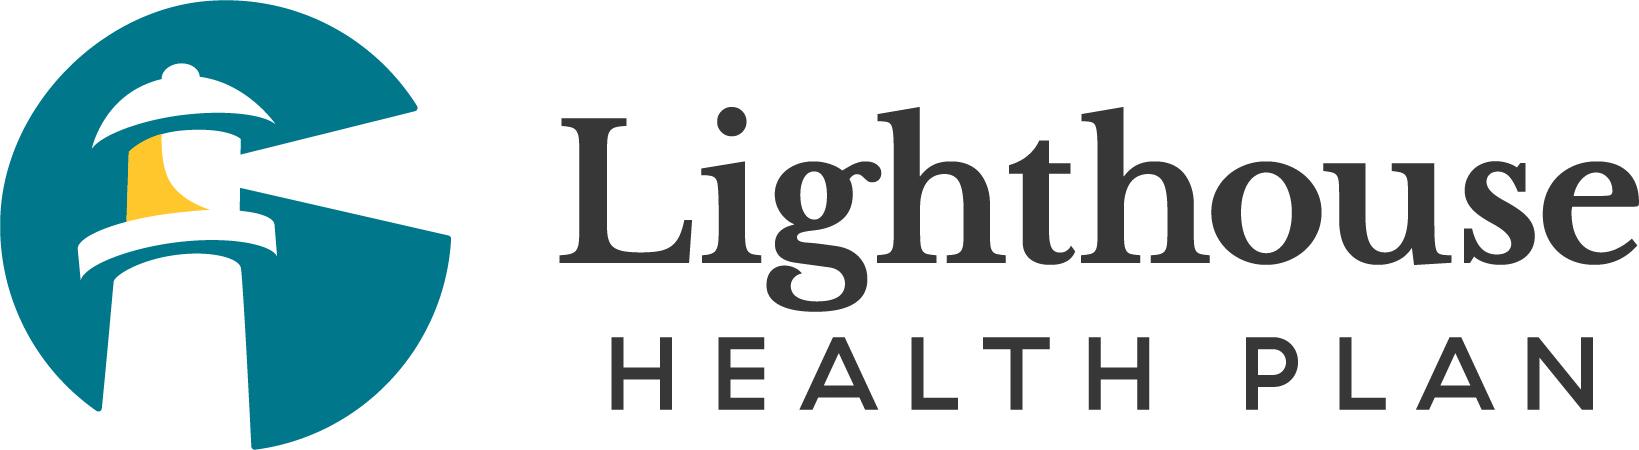 Lighthouse-HZ-RGB copy.jpg